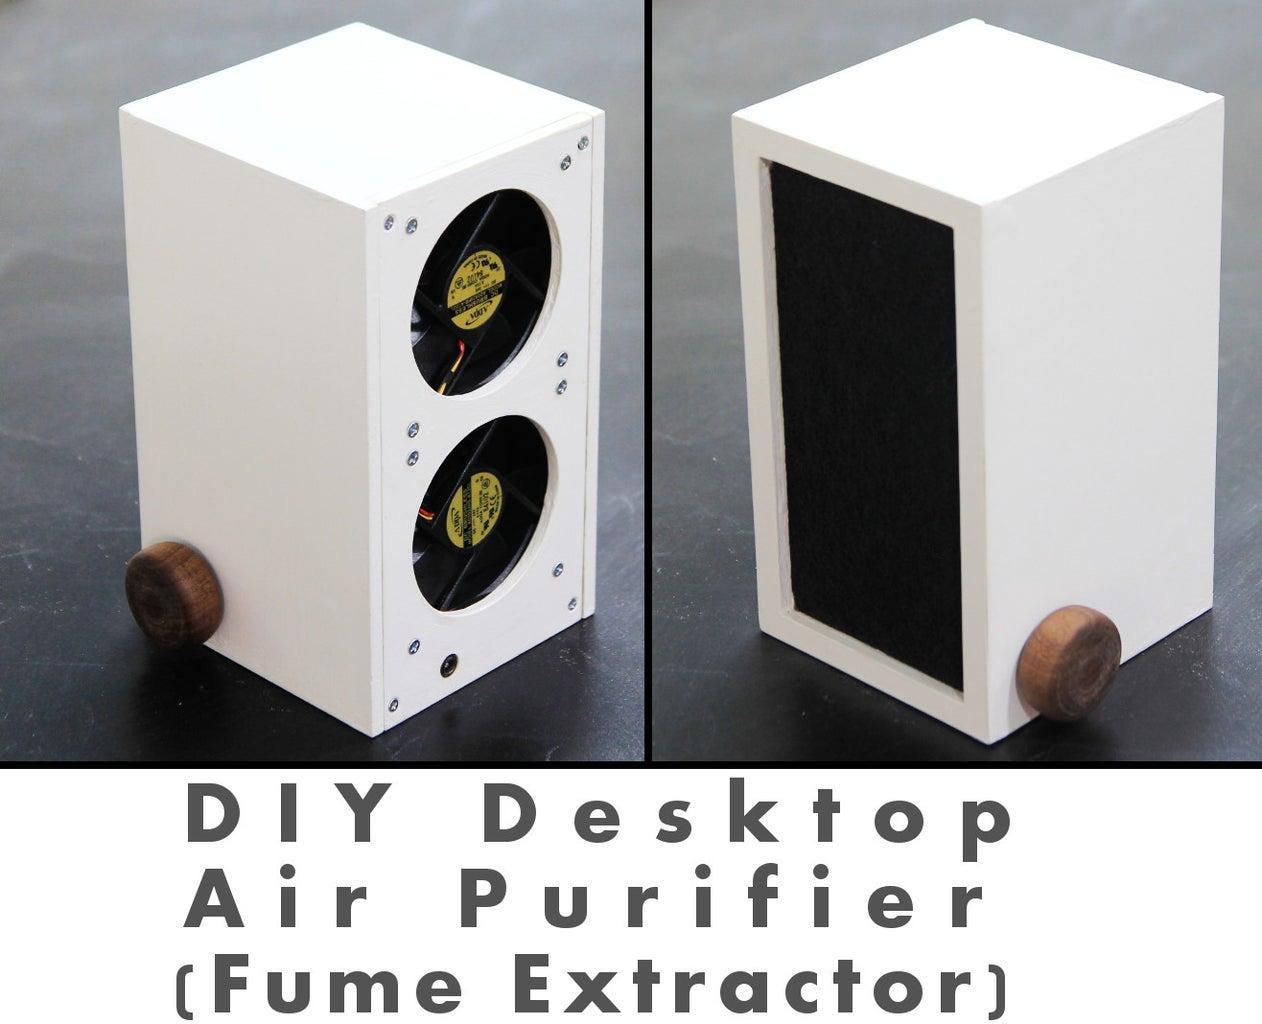 Desktop Air Purifier (Fume Extractor)